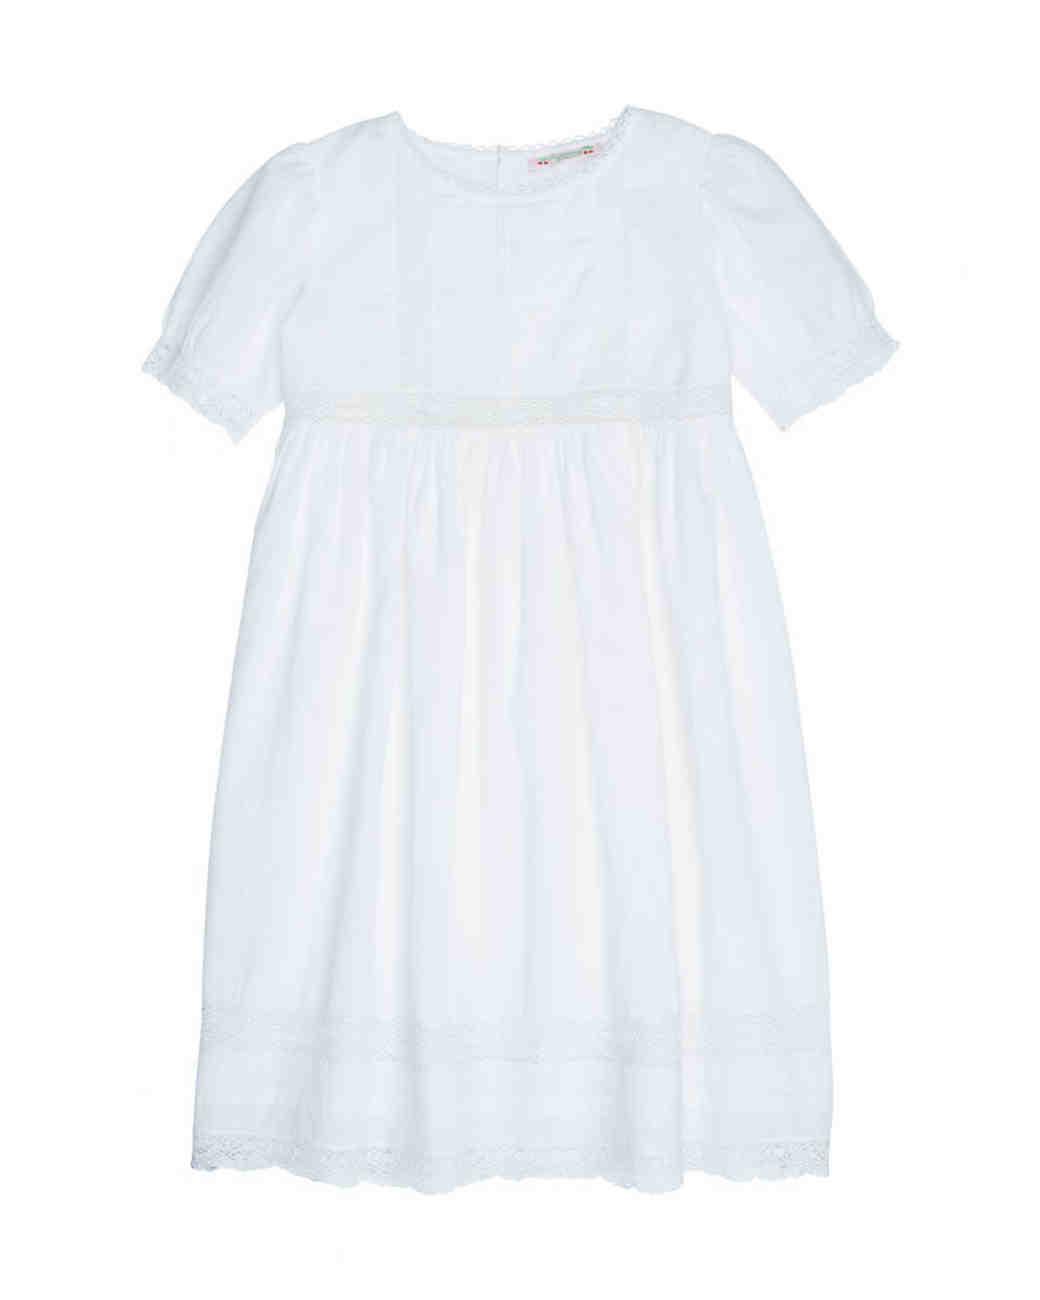 Cute And Comfortable Short Sleeve Flower Girl Dresses Martha